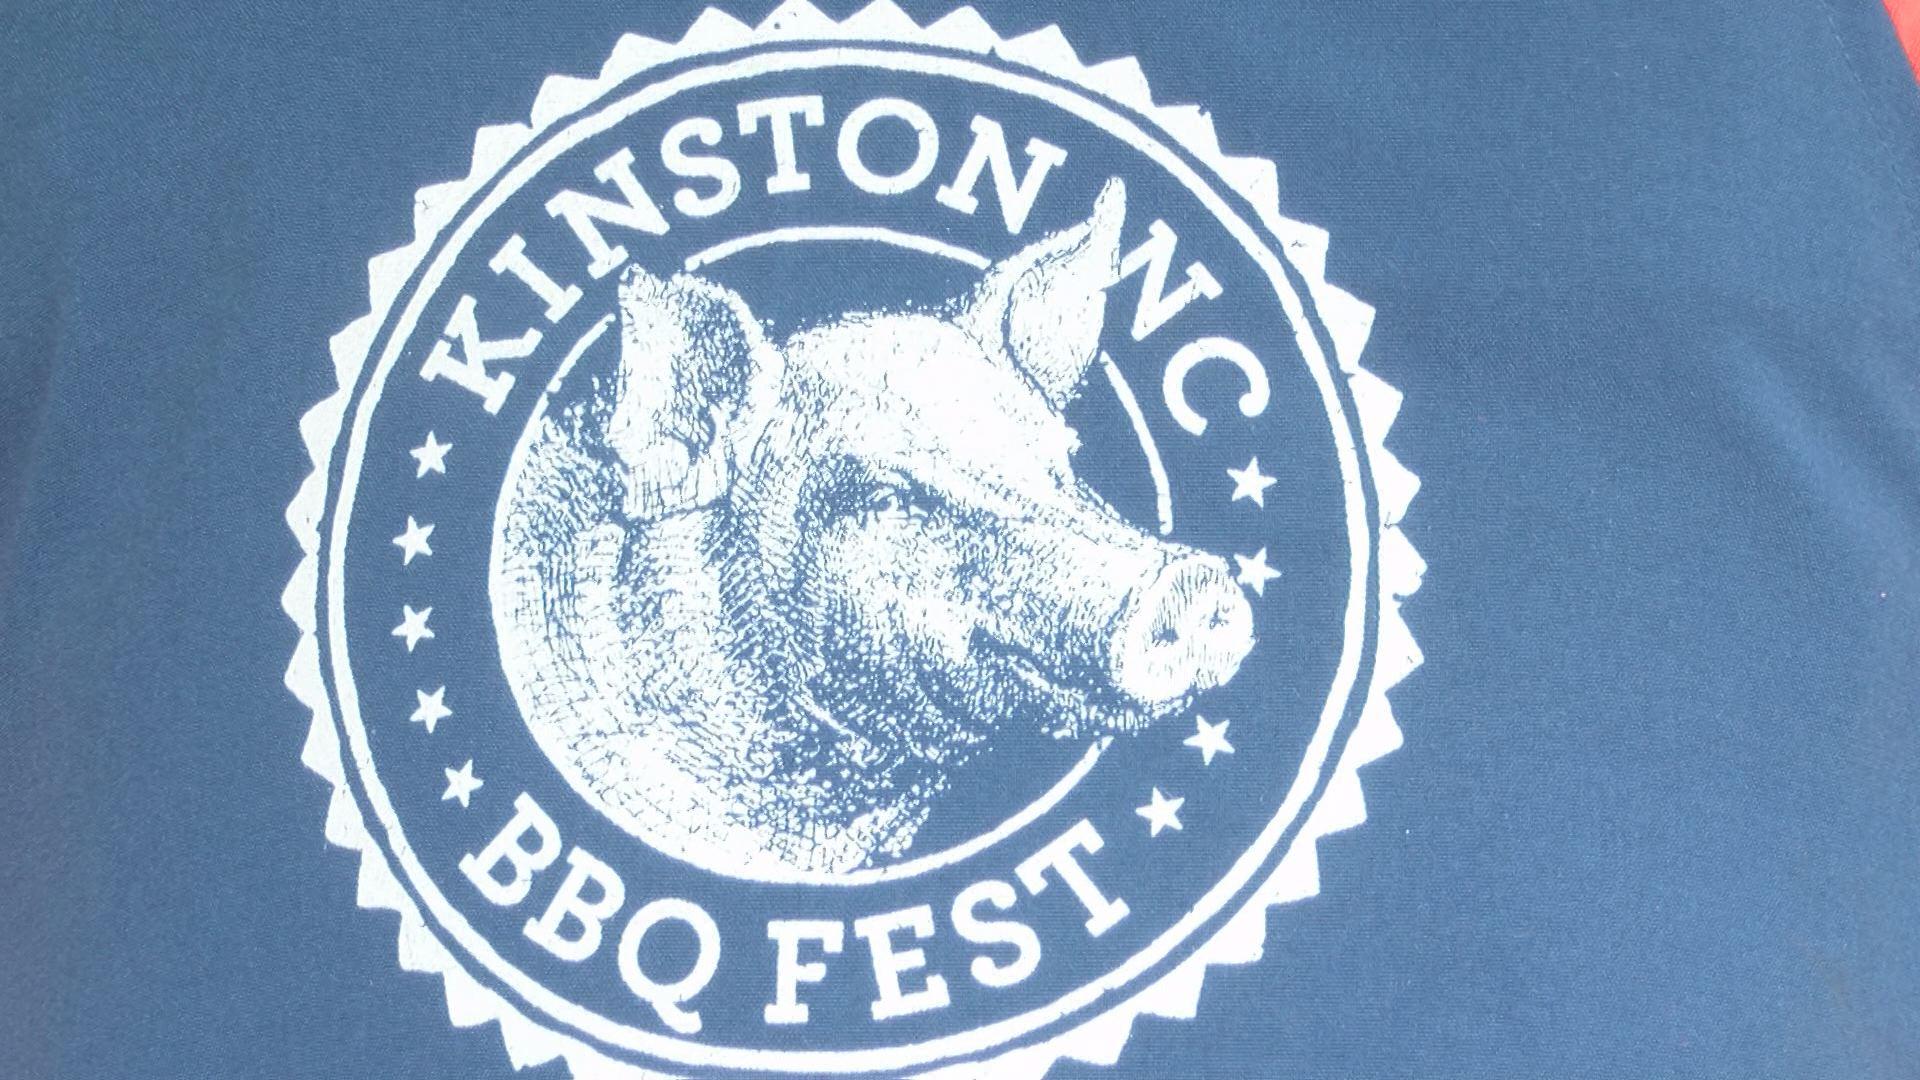 BBQ festival last day_399556